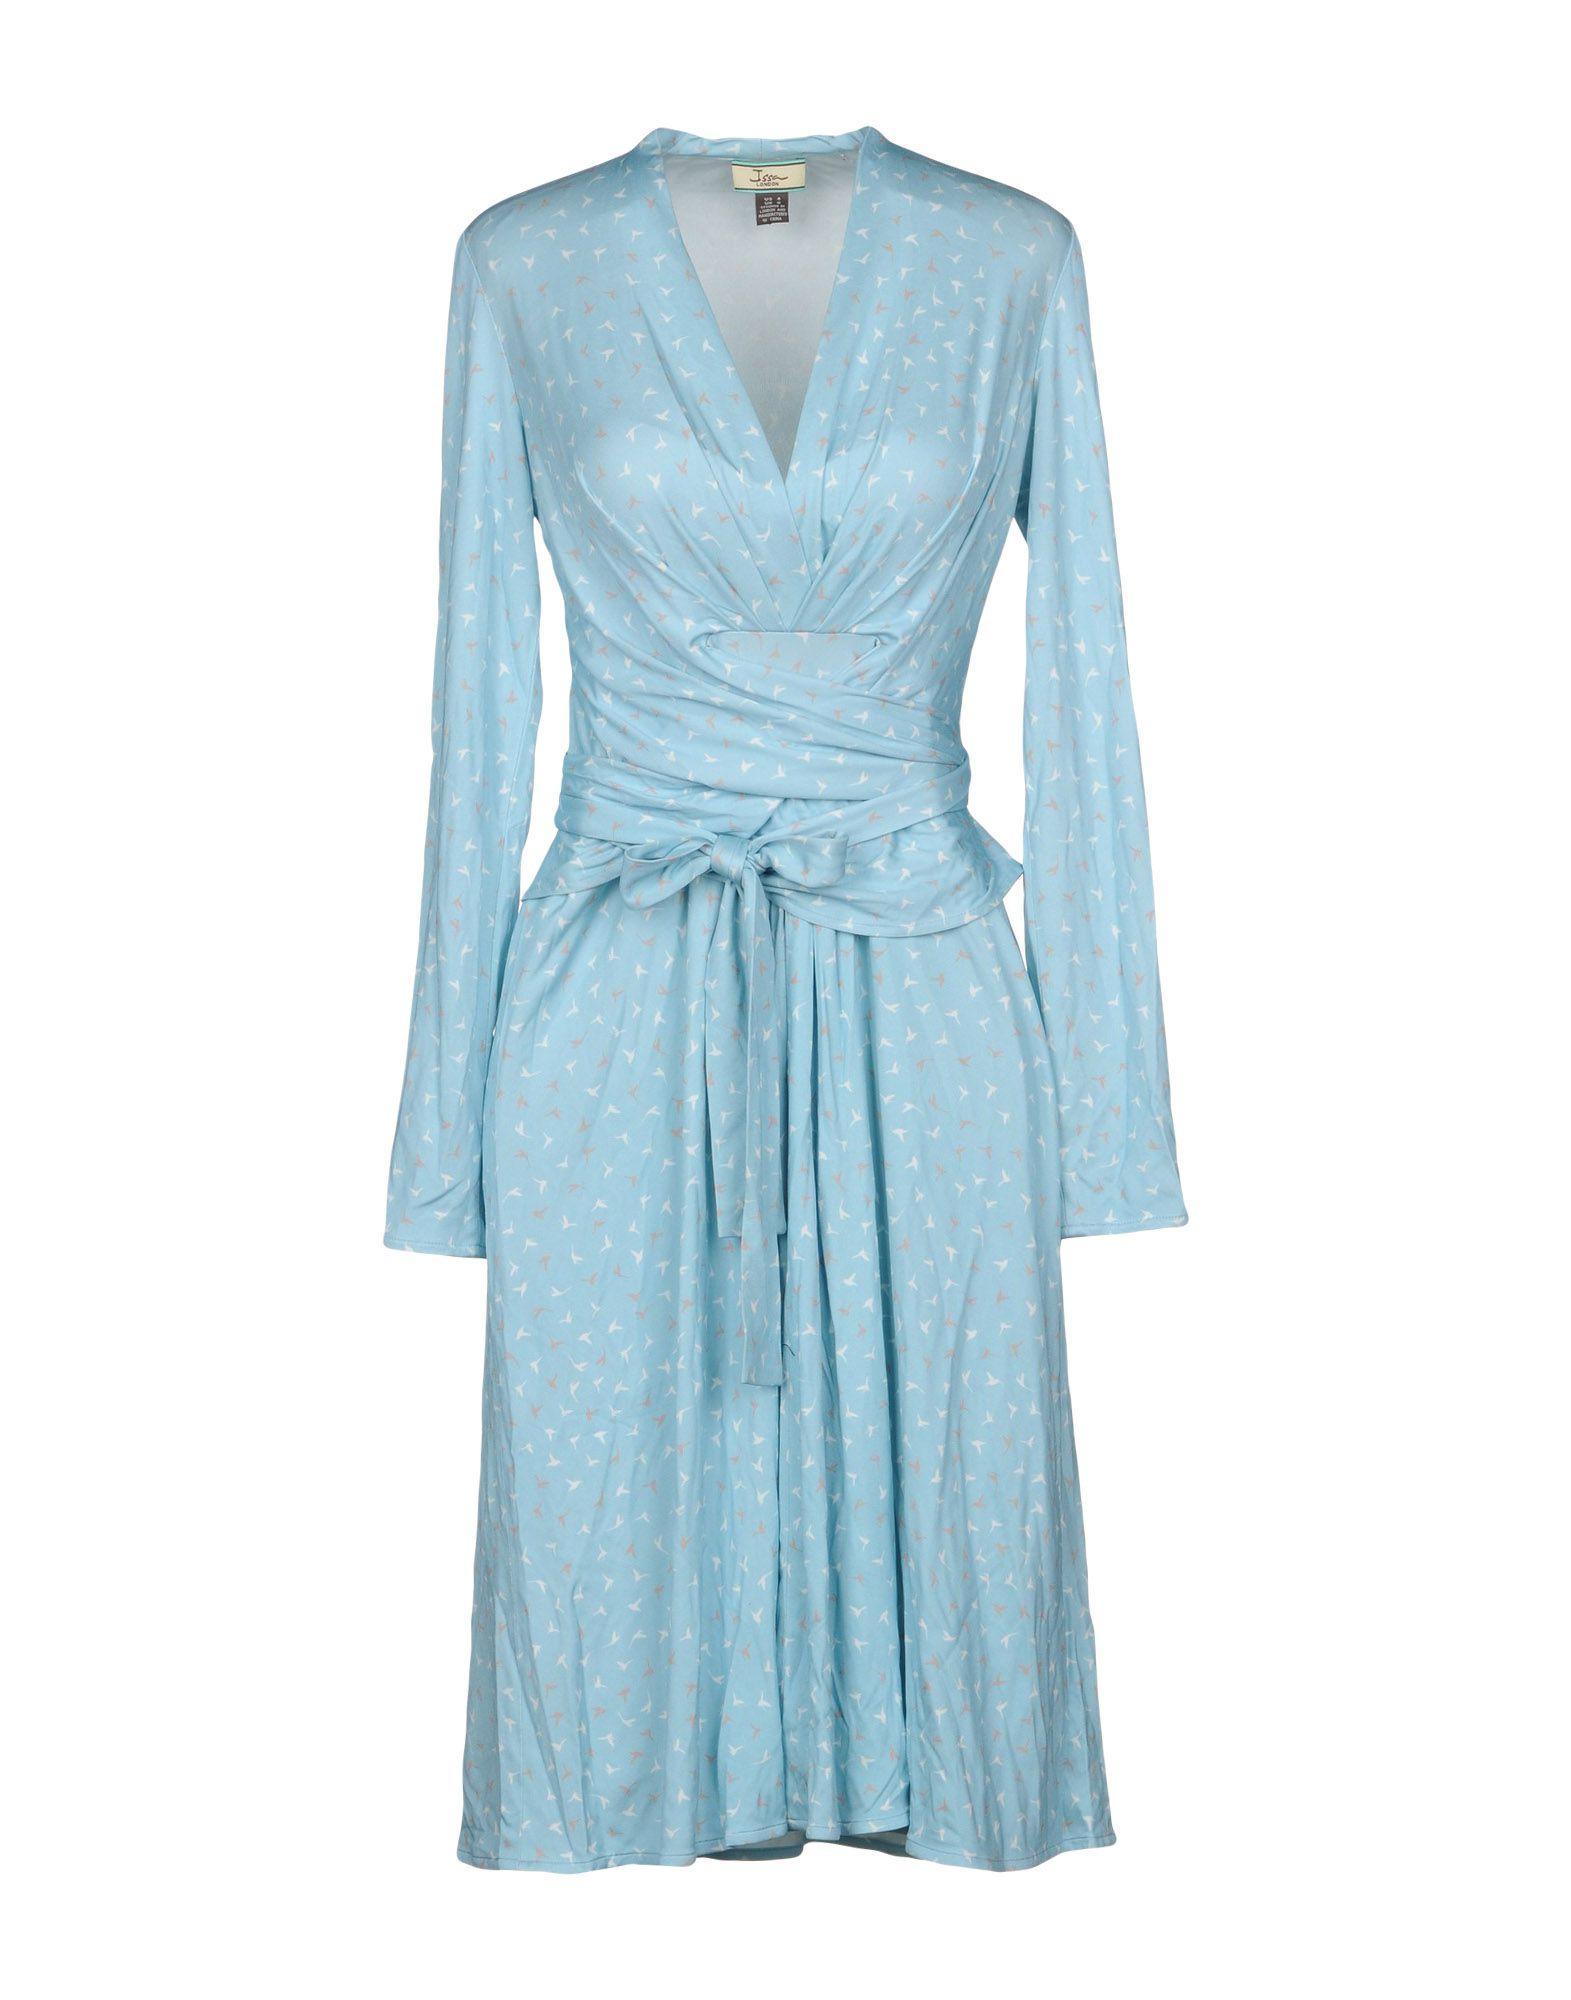 Issa Short Dress In Sky Blue